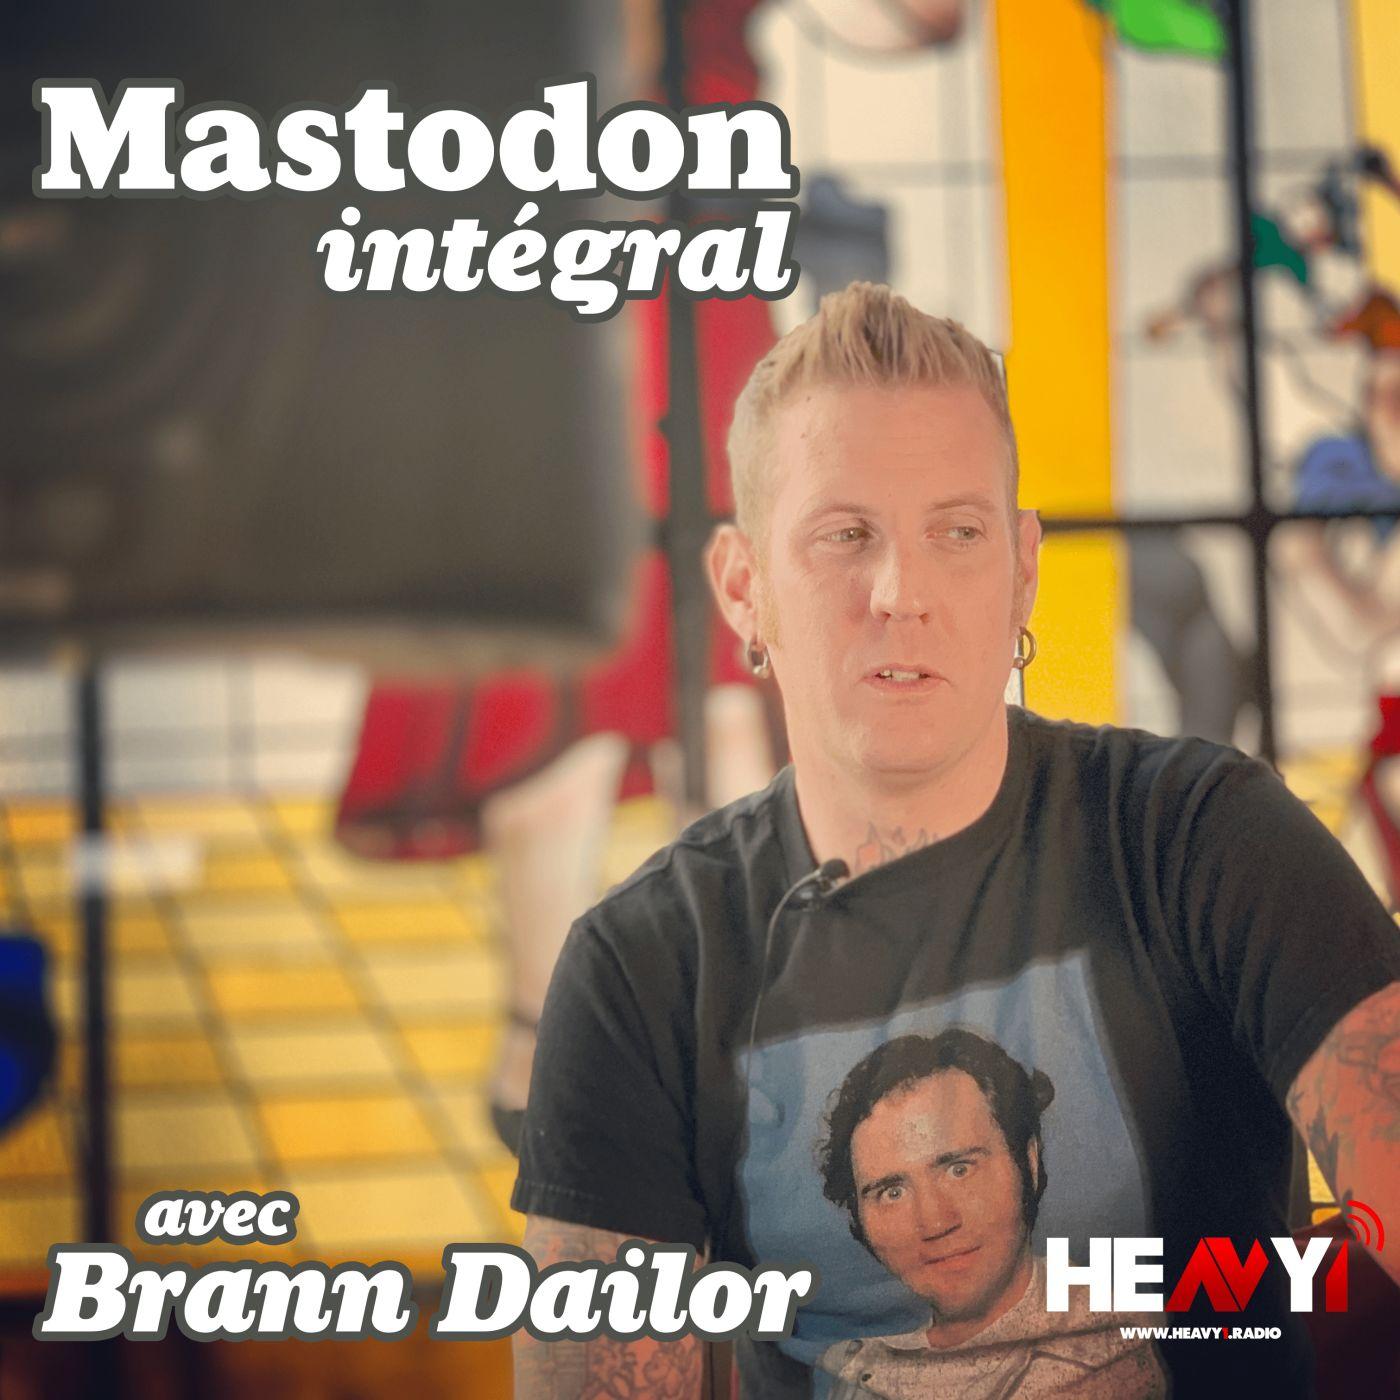 Mastodon Intégral